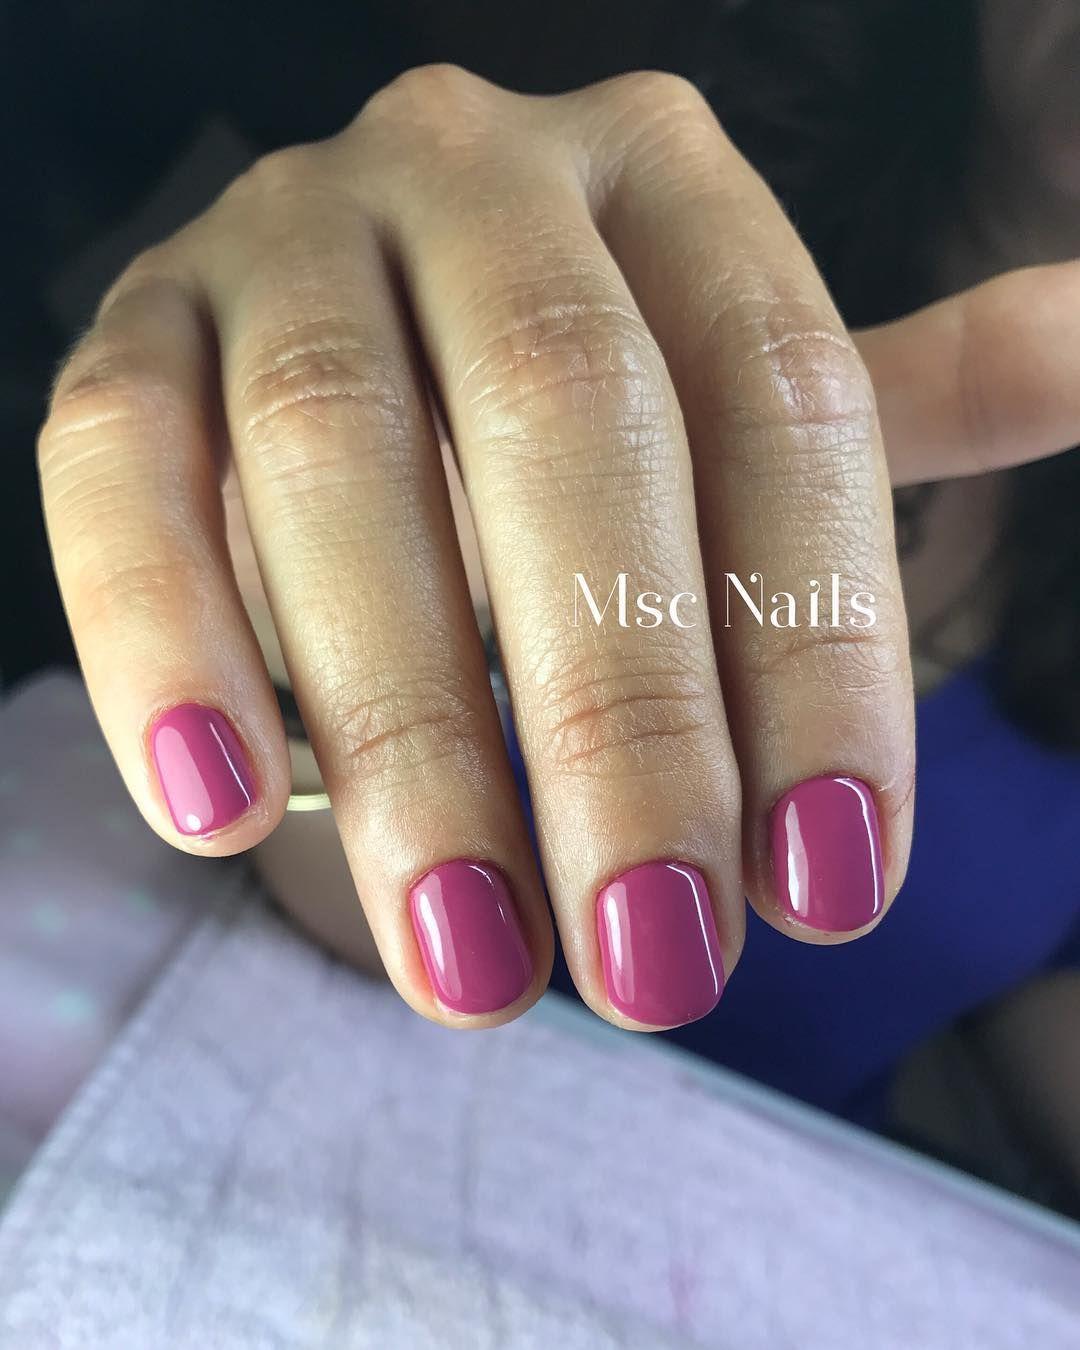 Semi! #mscnails #instanails #santperederibes #nailstagram #gelpolish #semipermanente #semilac #cuccio #manicure #manicurarusa #russianmanicure #emanicure #nofilter #sinfiltro